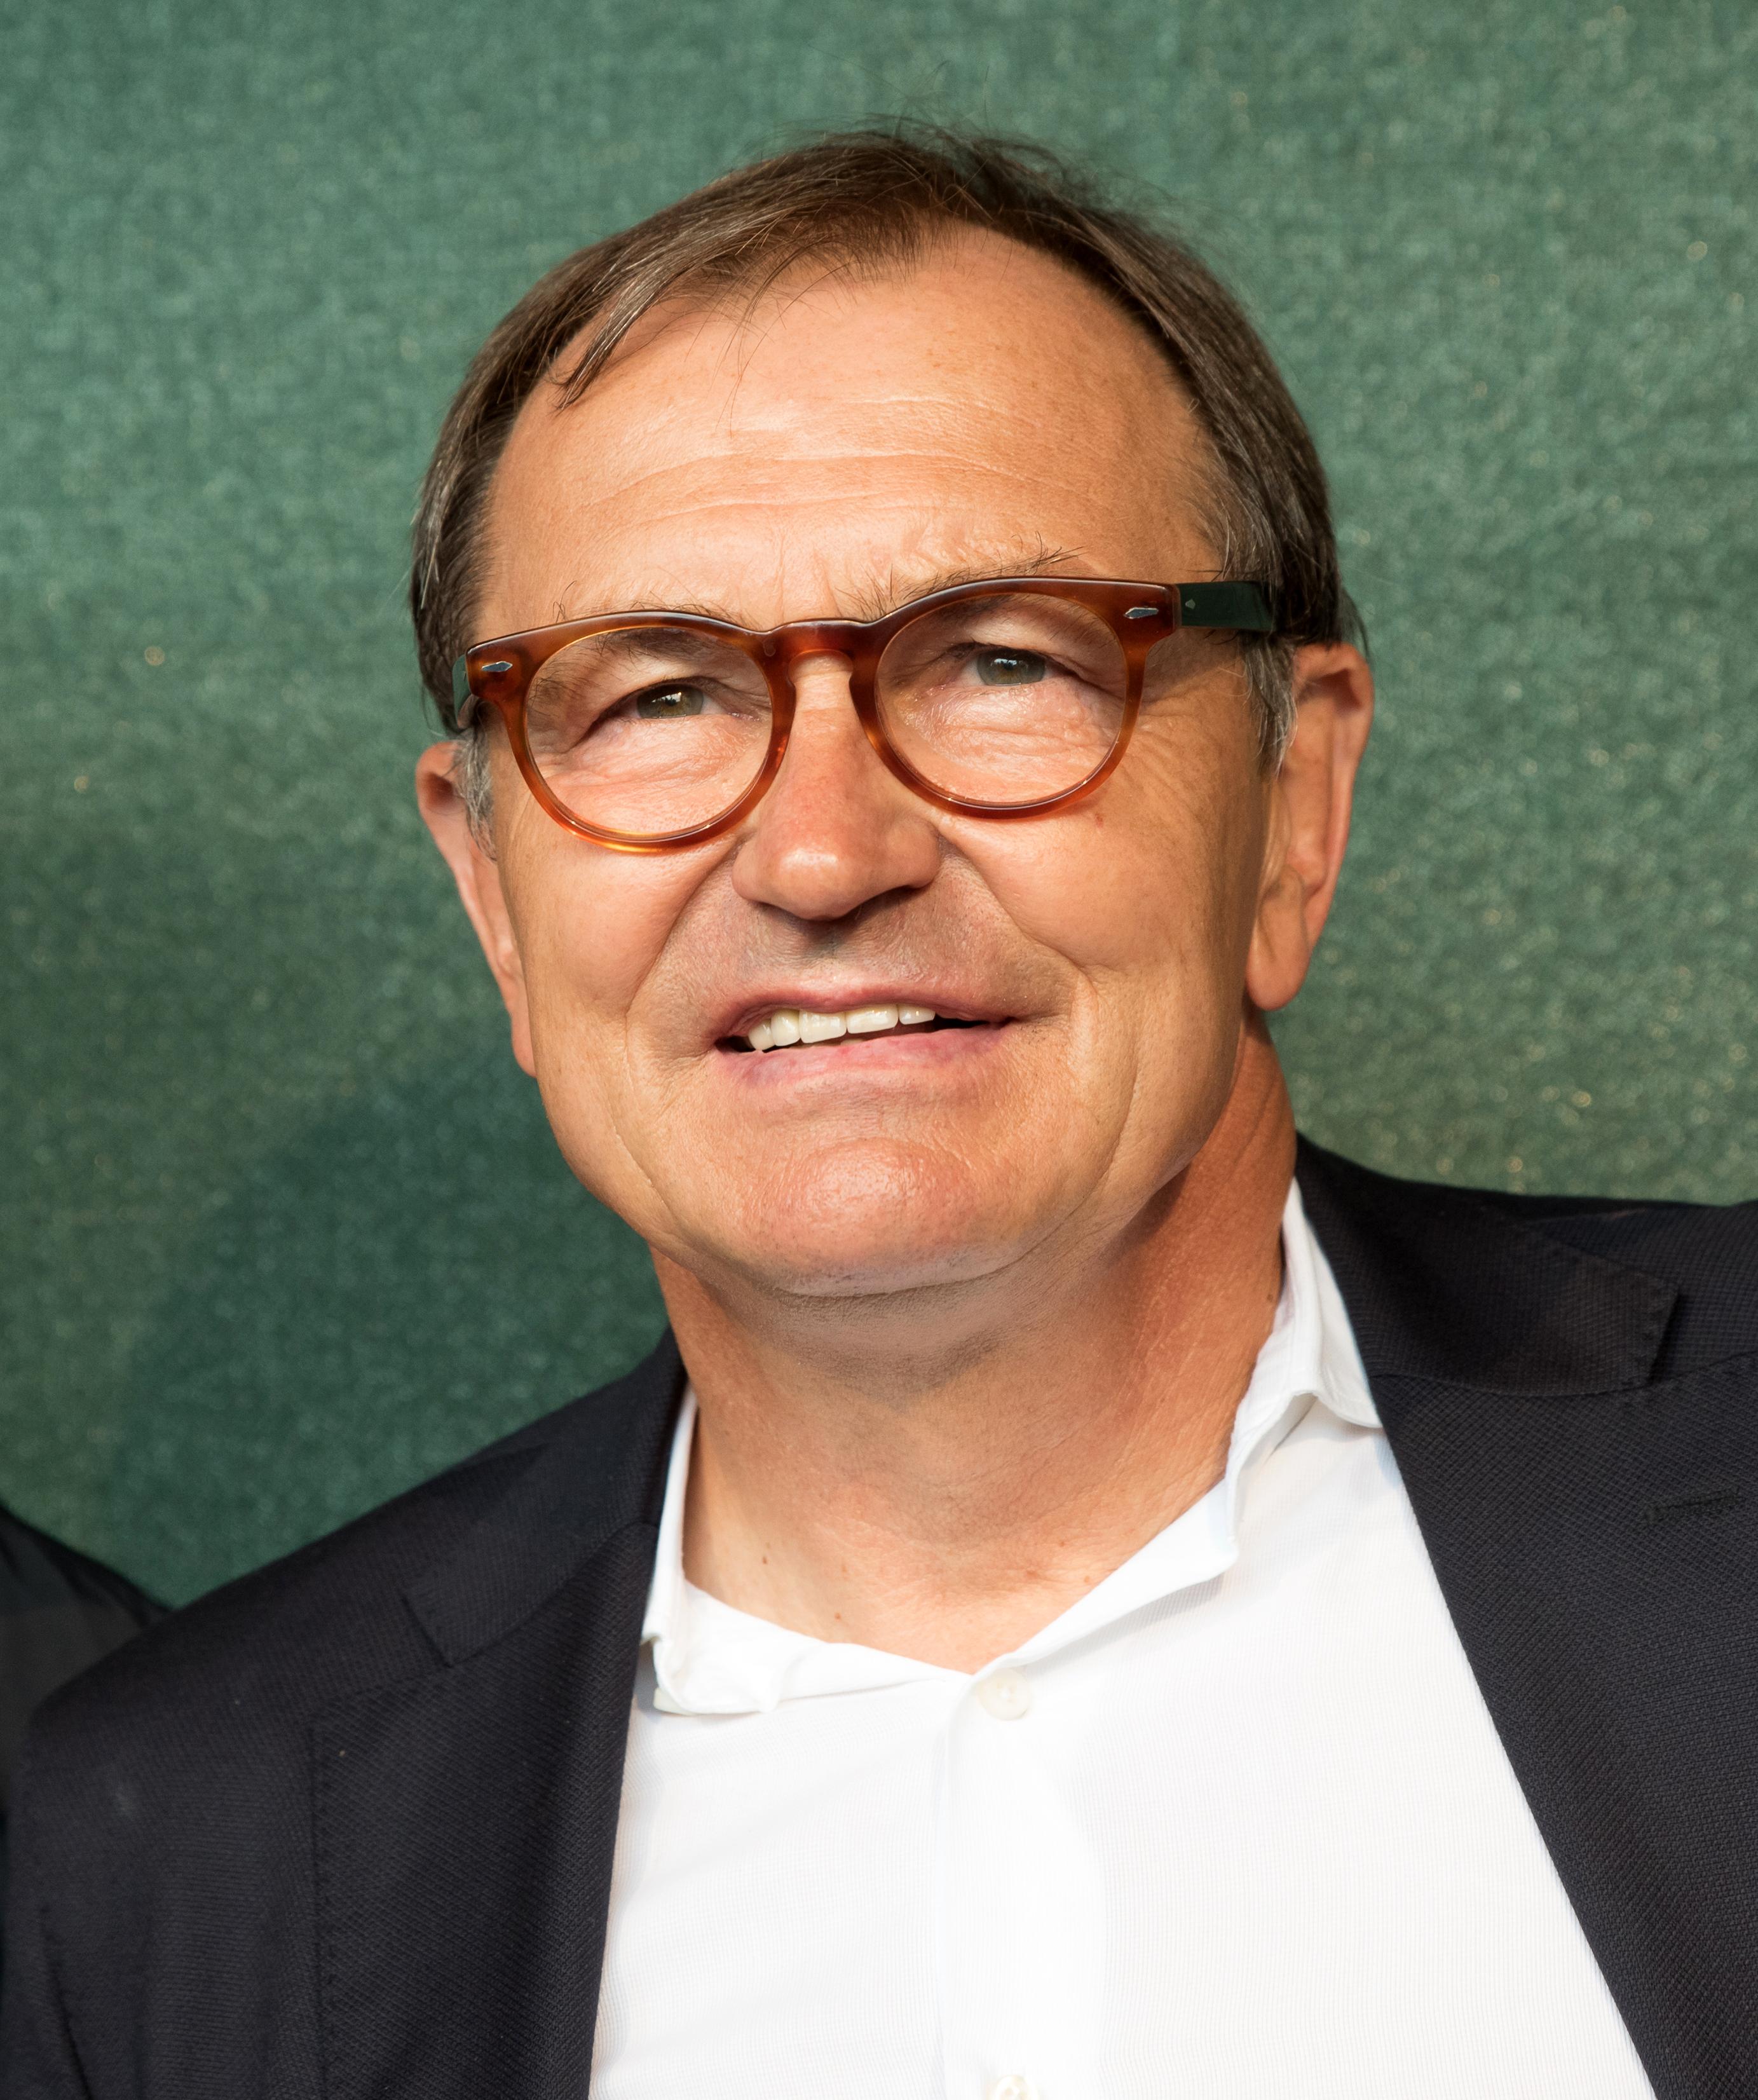 Ewald Lienen Wikipedia